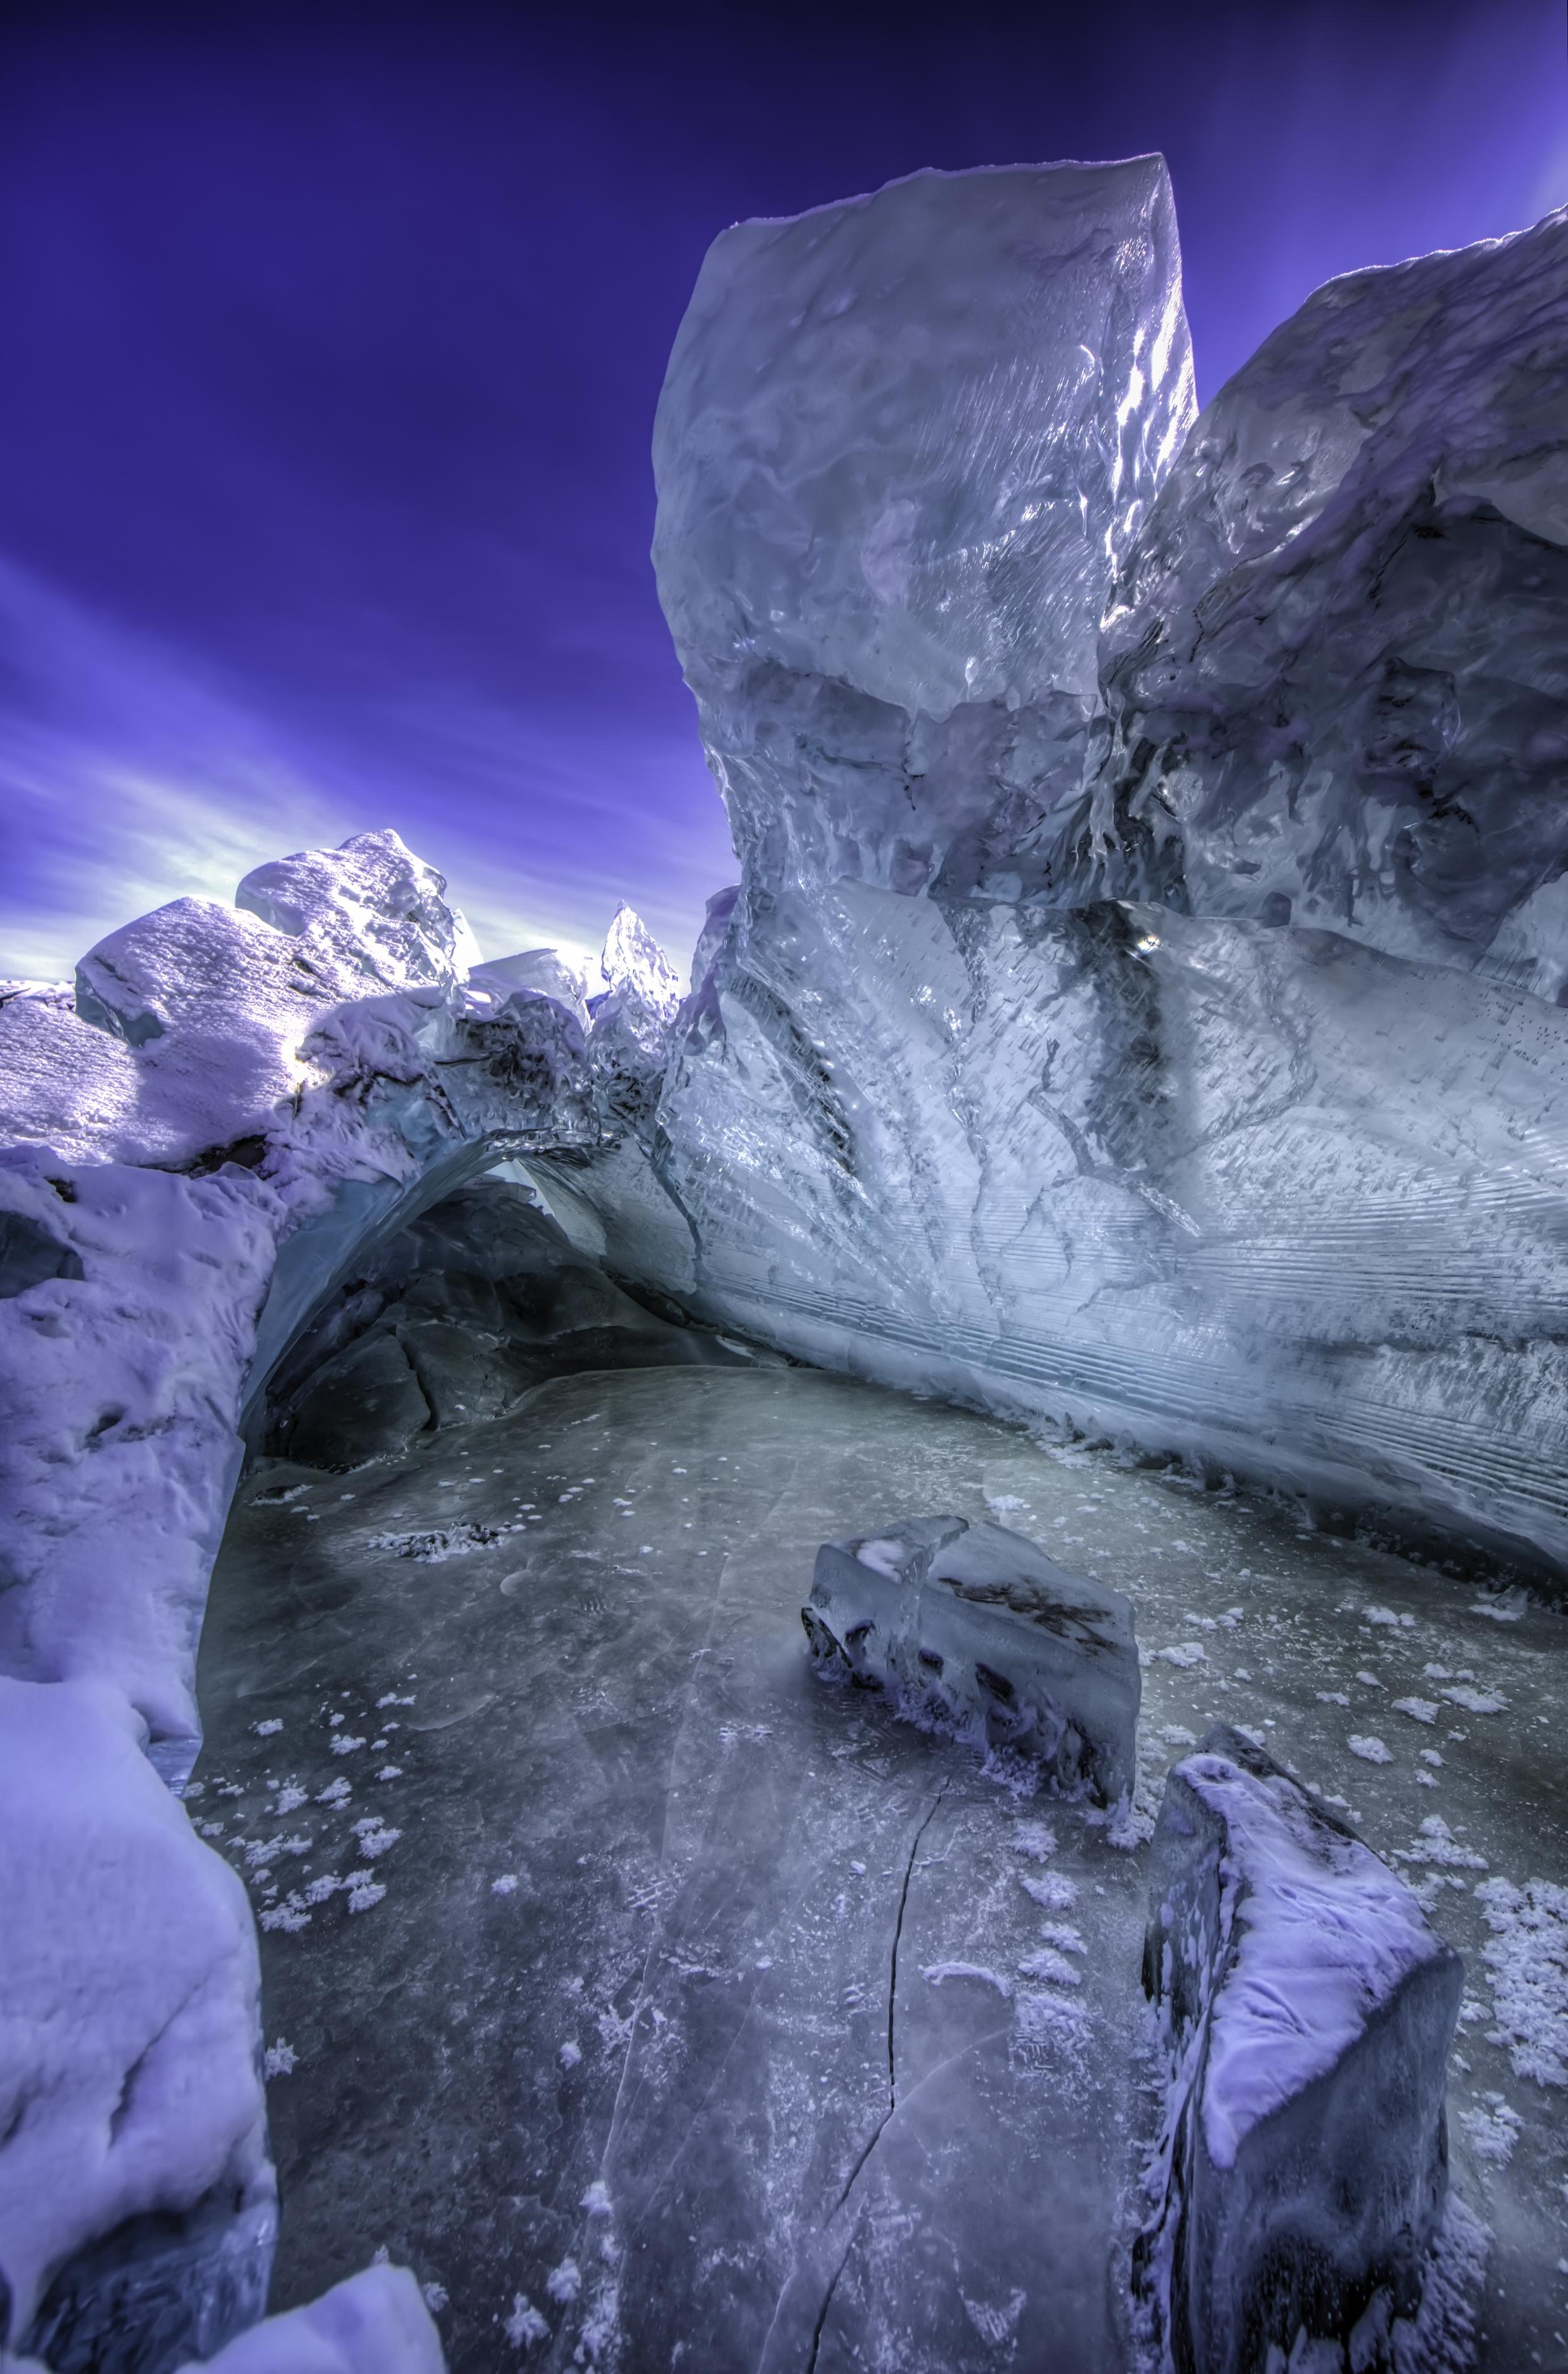 The Unbelievable Ice Hideaway